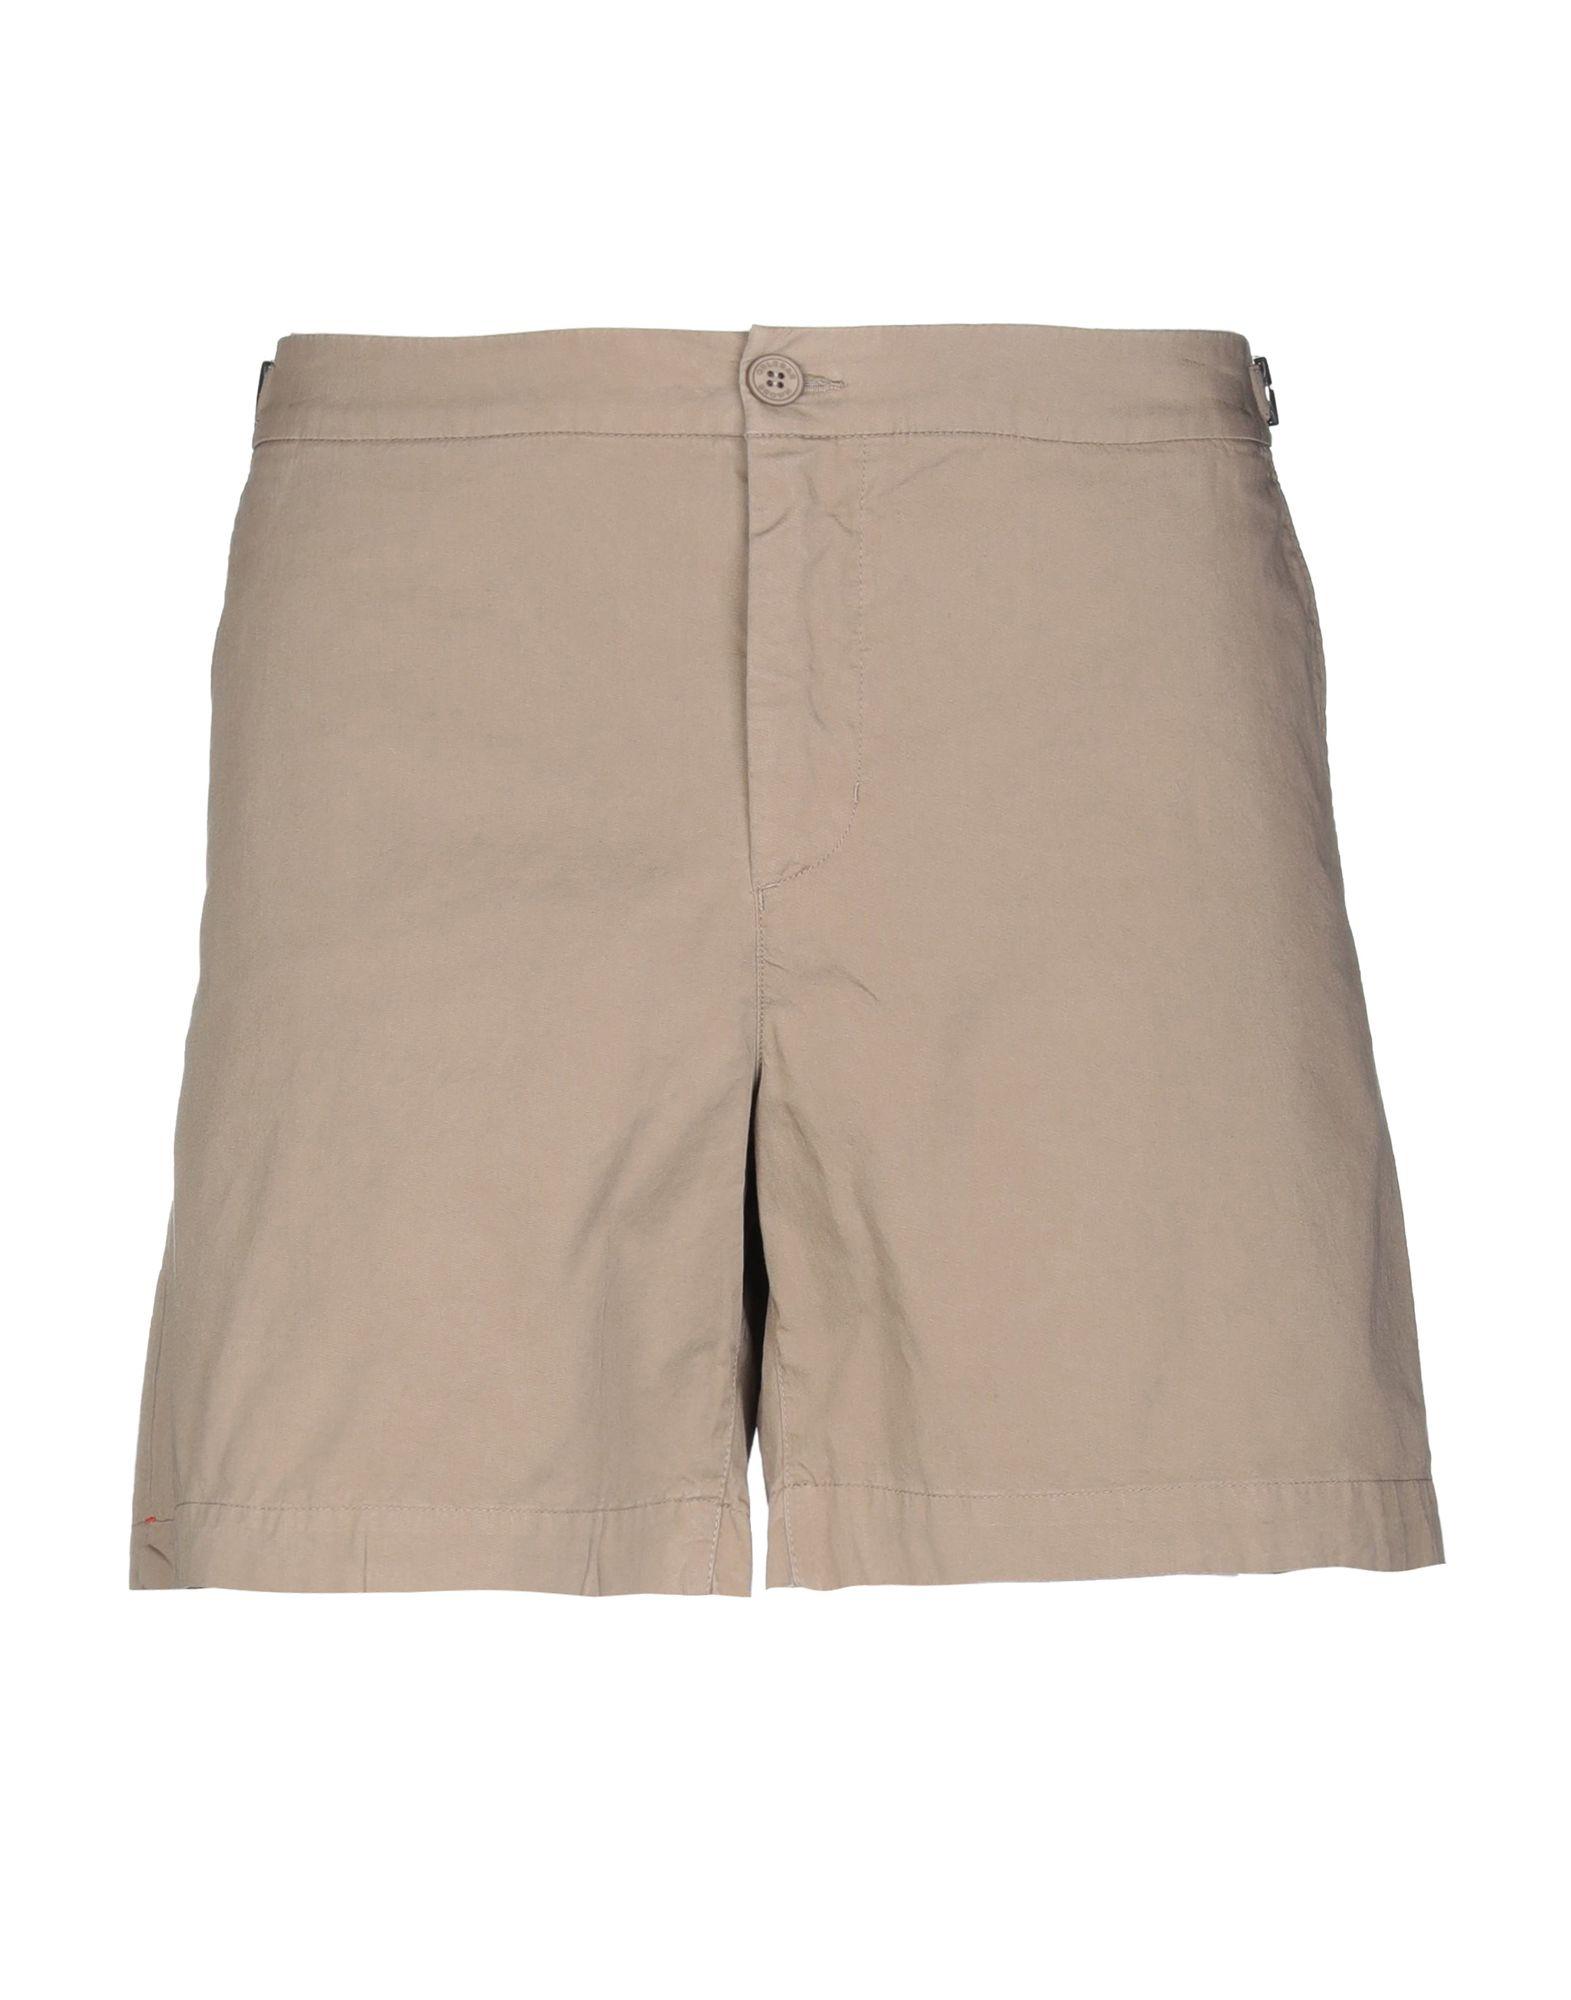 ORLEBAR BROWN Повседневные шорты классические мужские шорты insight exiled brown slub